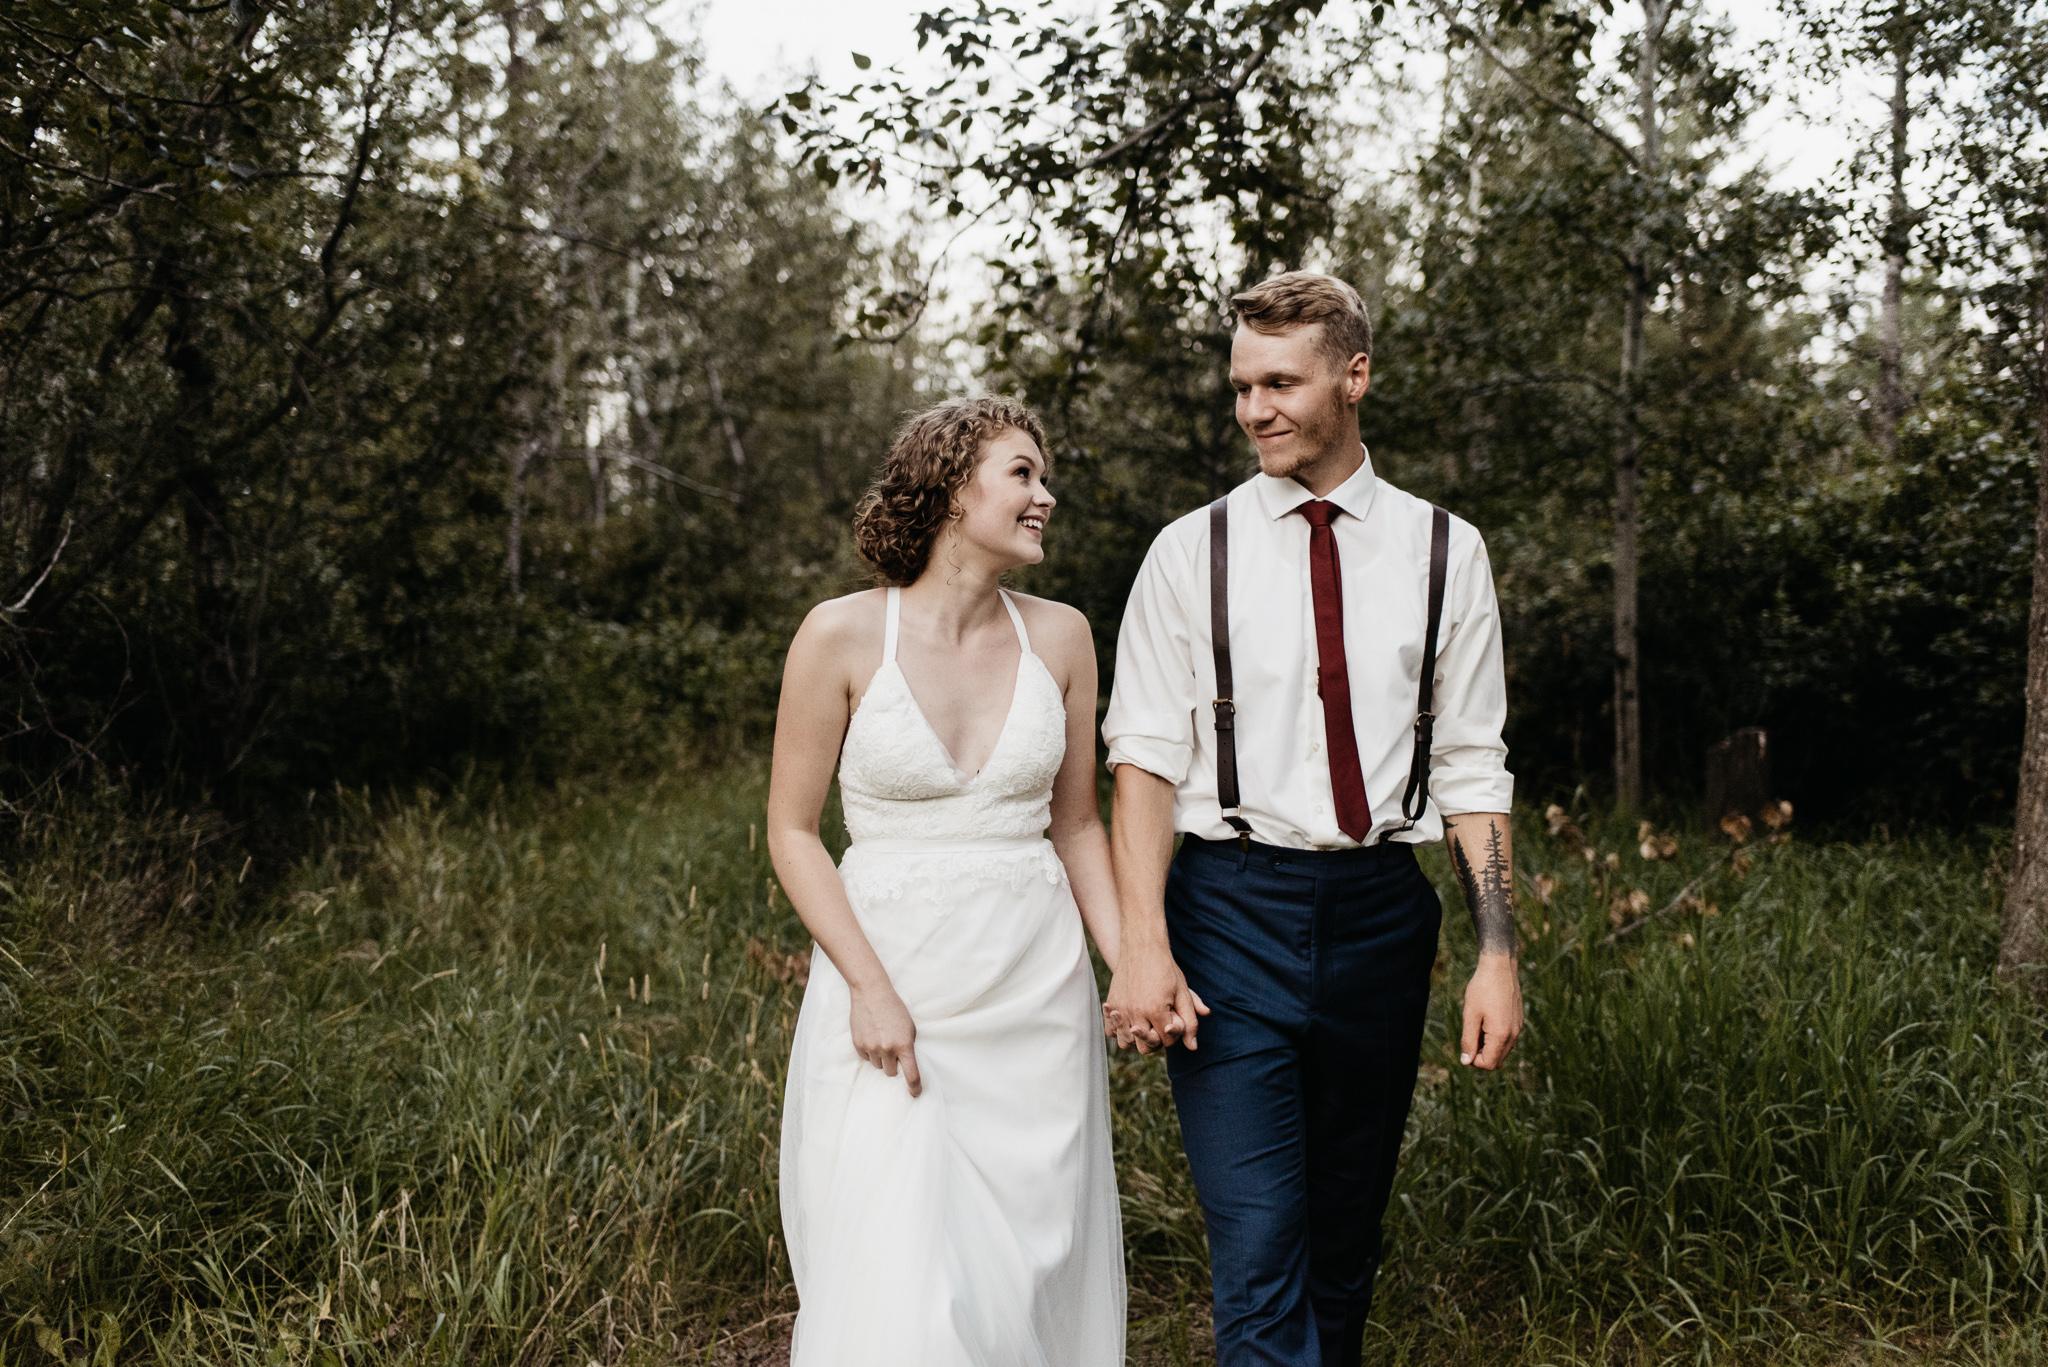 J&C-Weddingblog-109.jpg